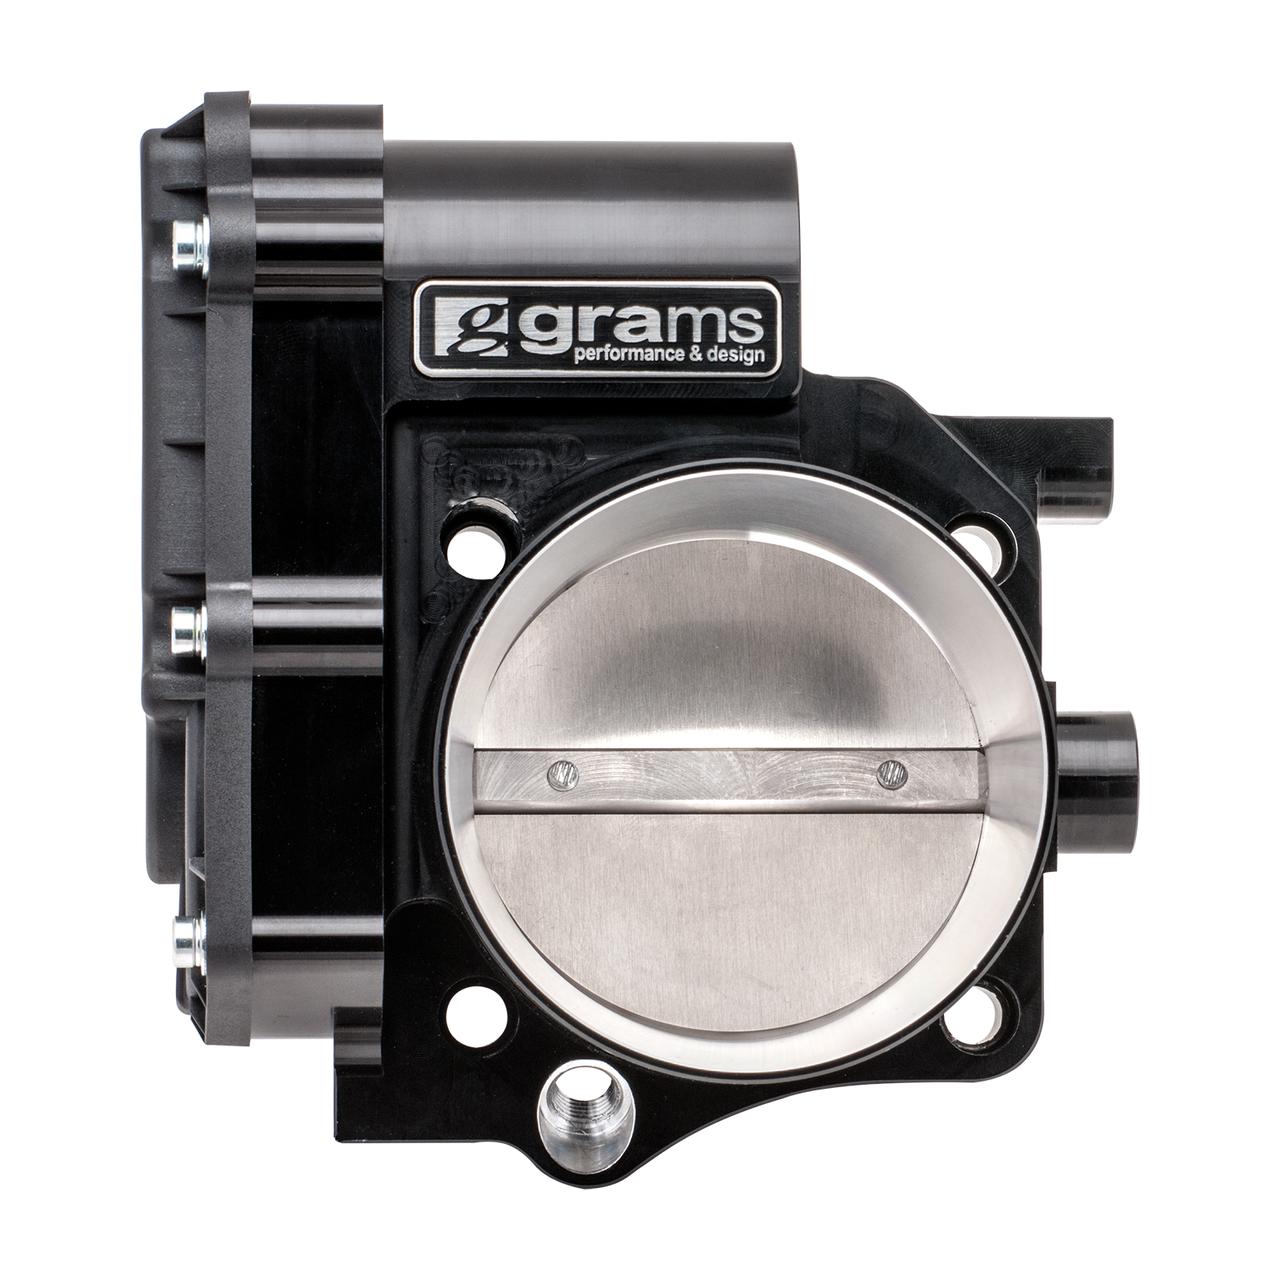 Grams 72mm DBW Black Series Pro Series Throttle Body